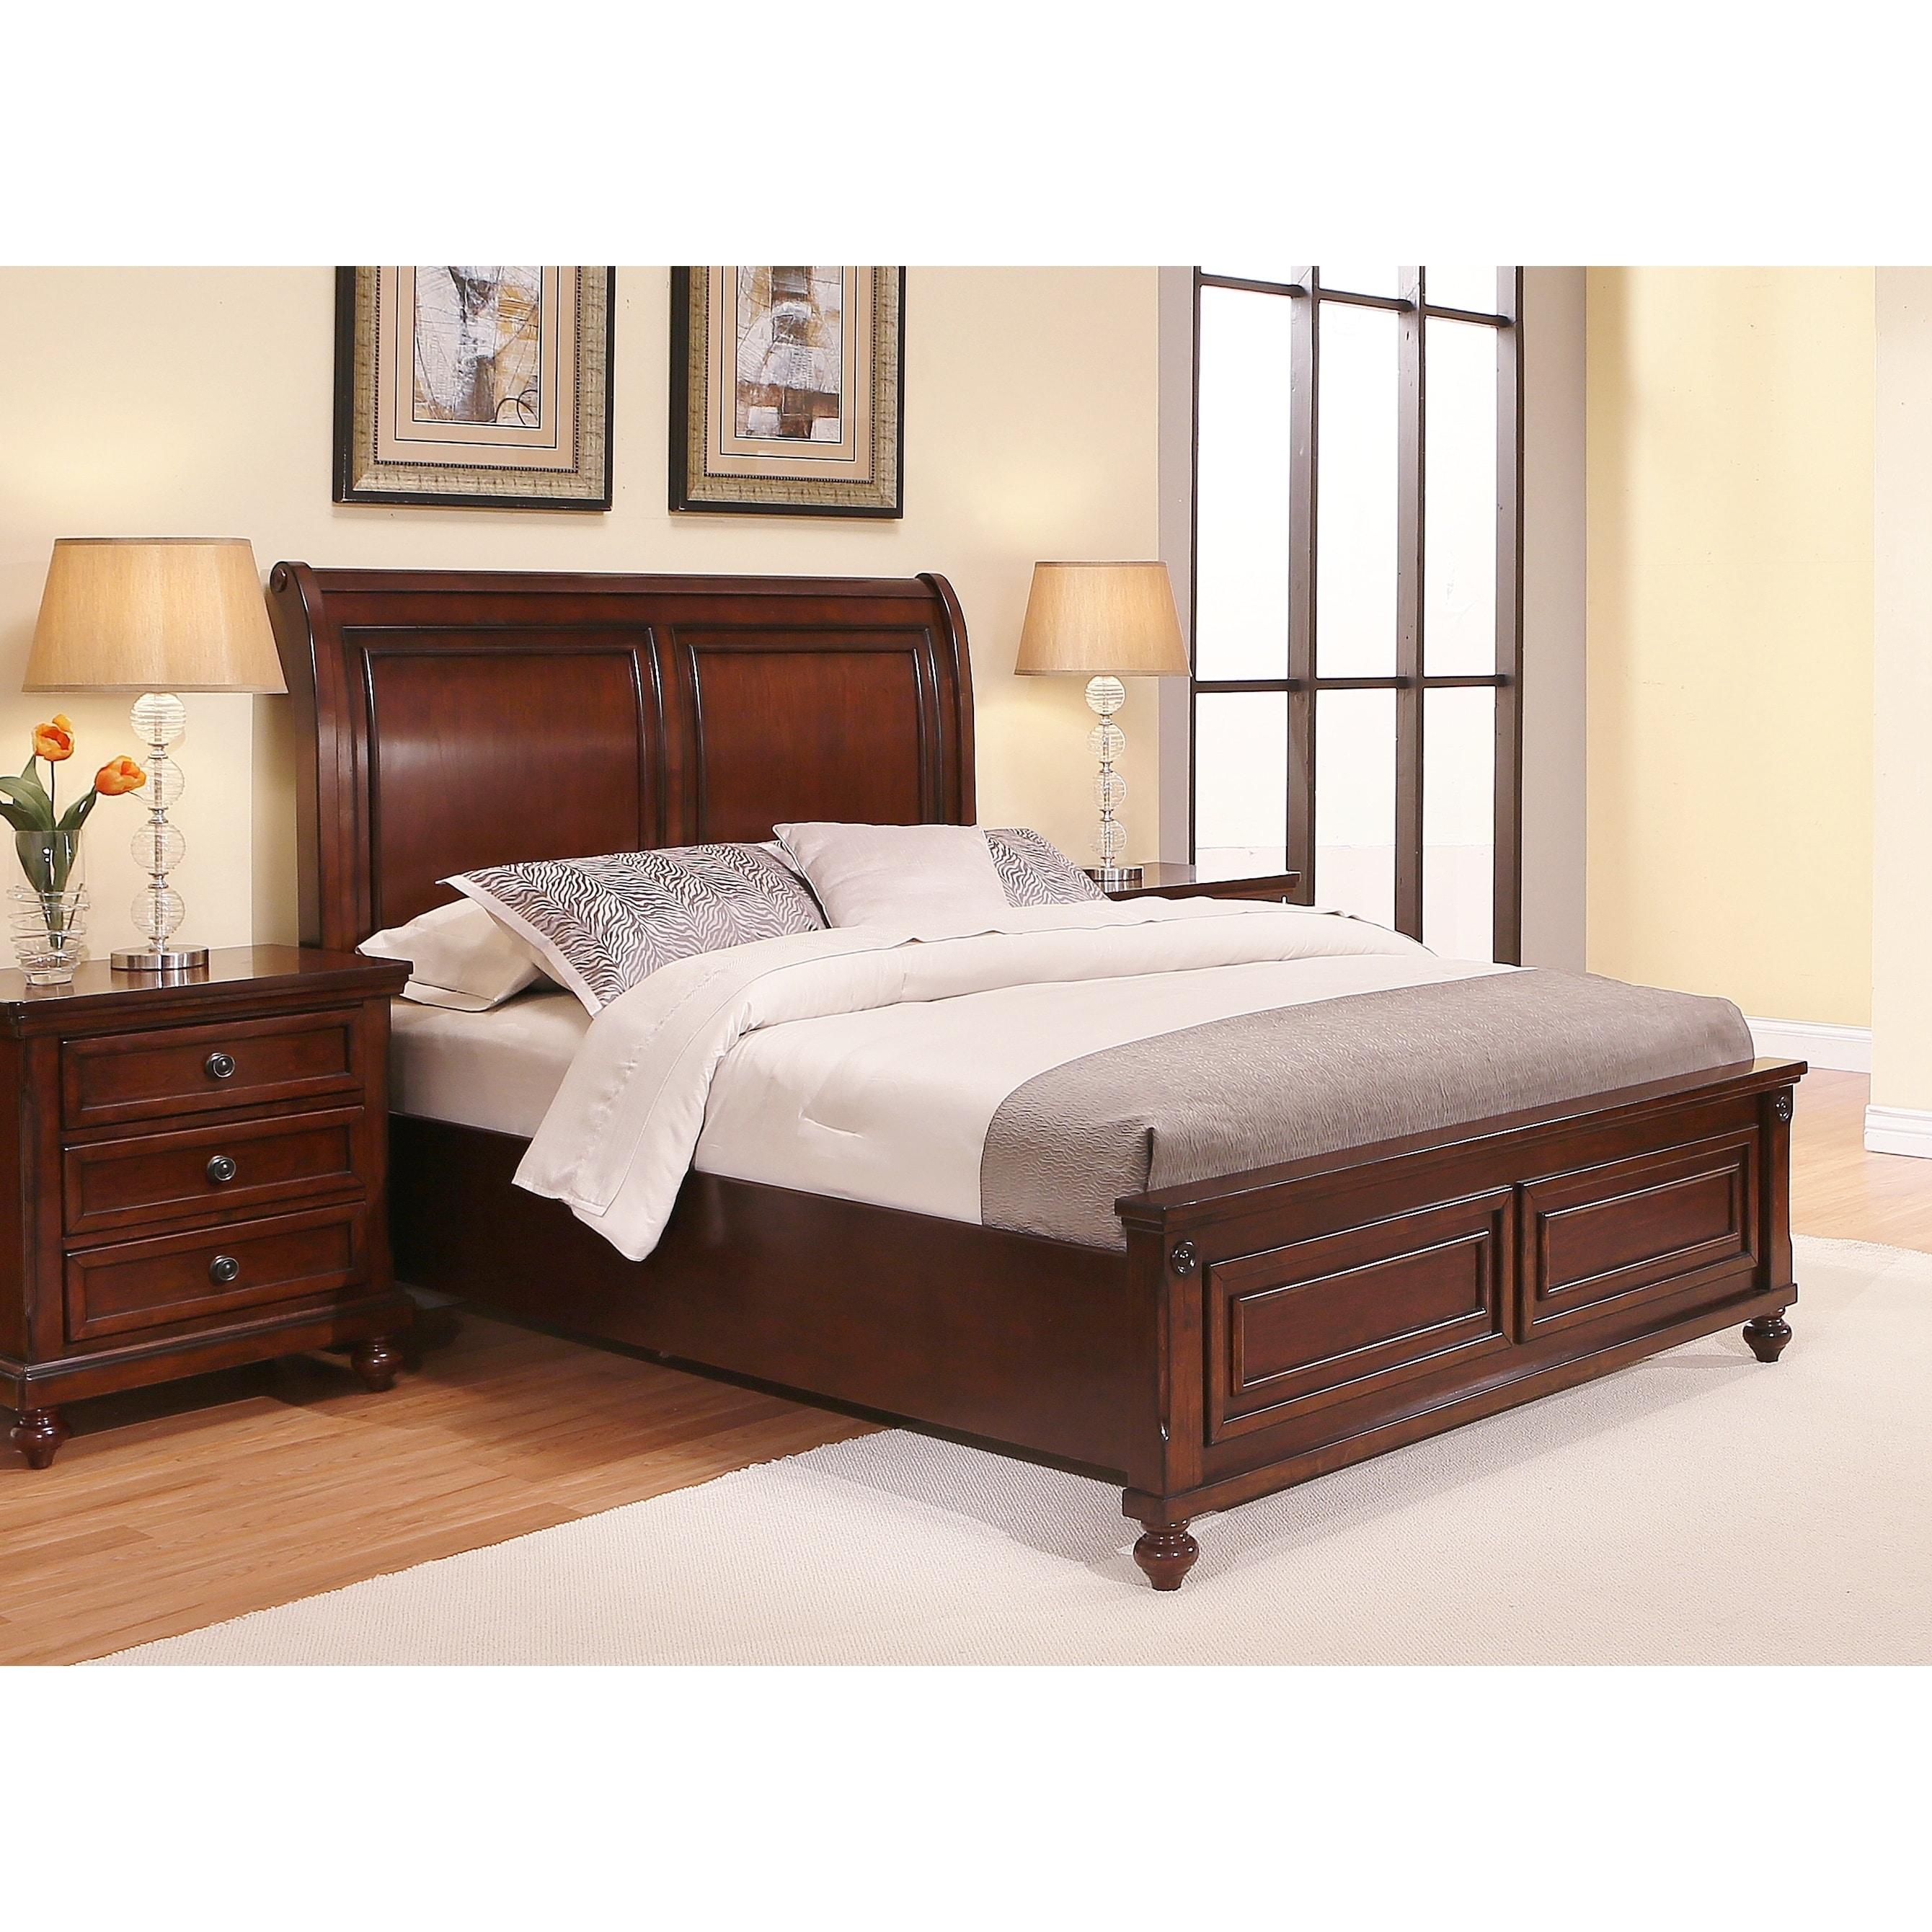 Abbyson Caprice Cherry Wood Bedroom Set (4 Piece)